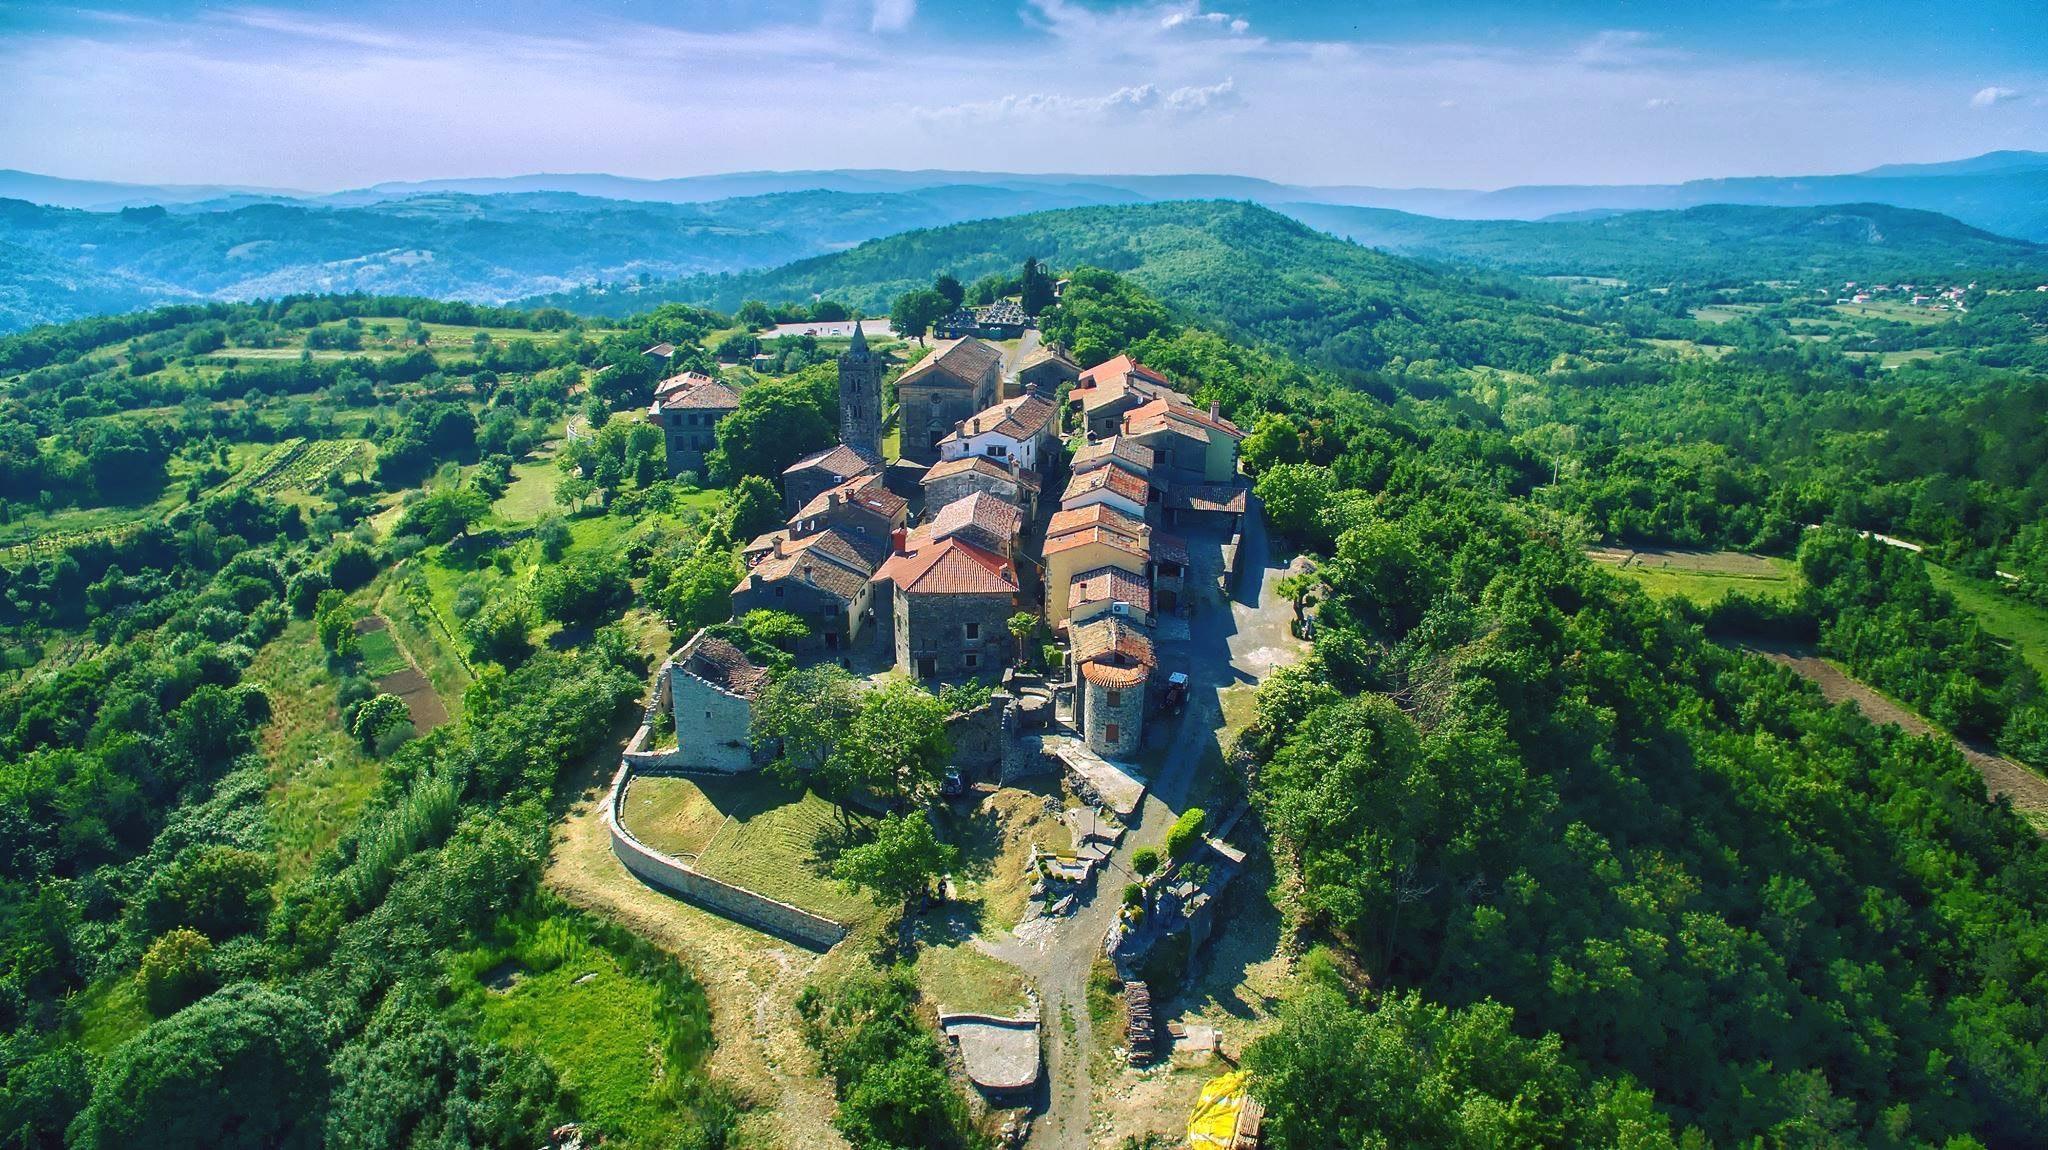 hum coatia smallest town in the world